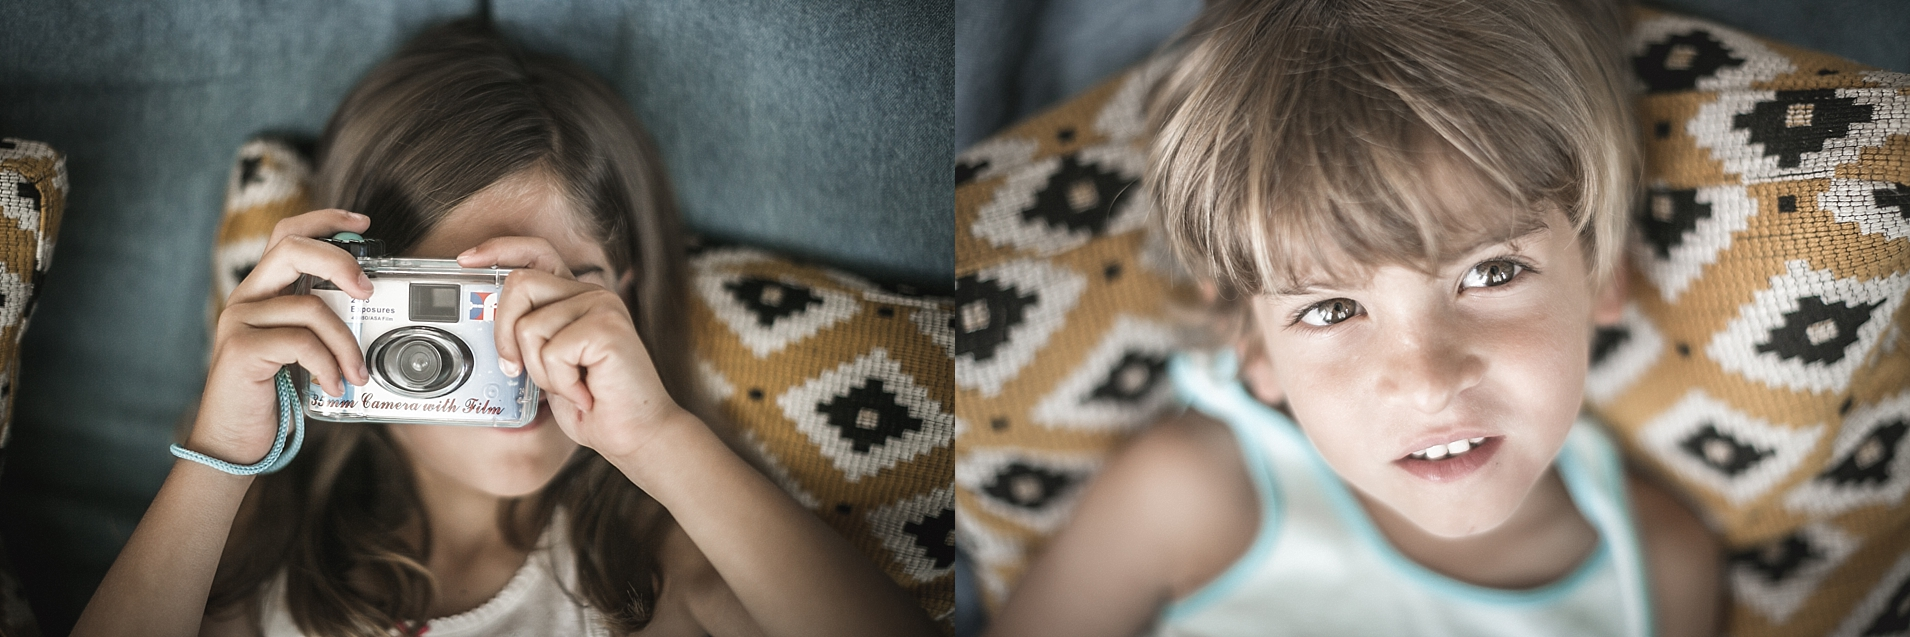 fotografia niños a domicilio